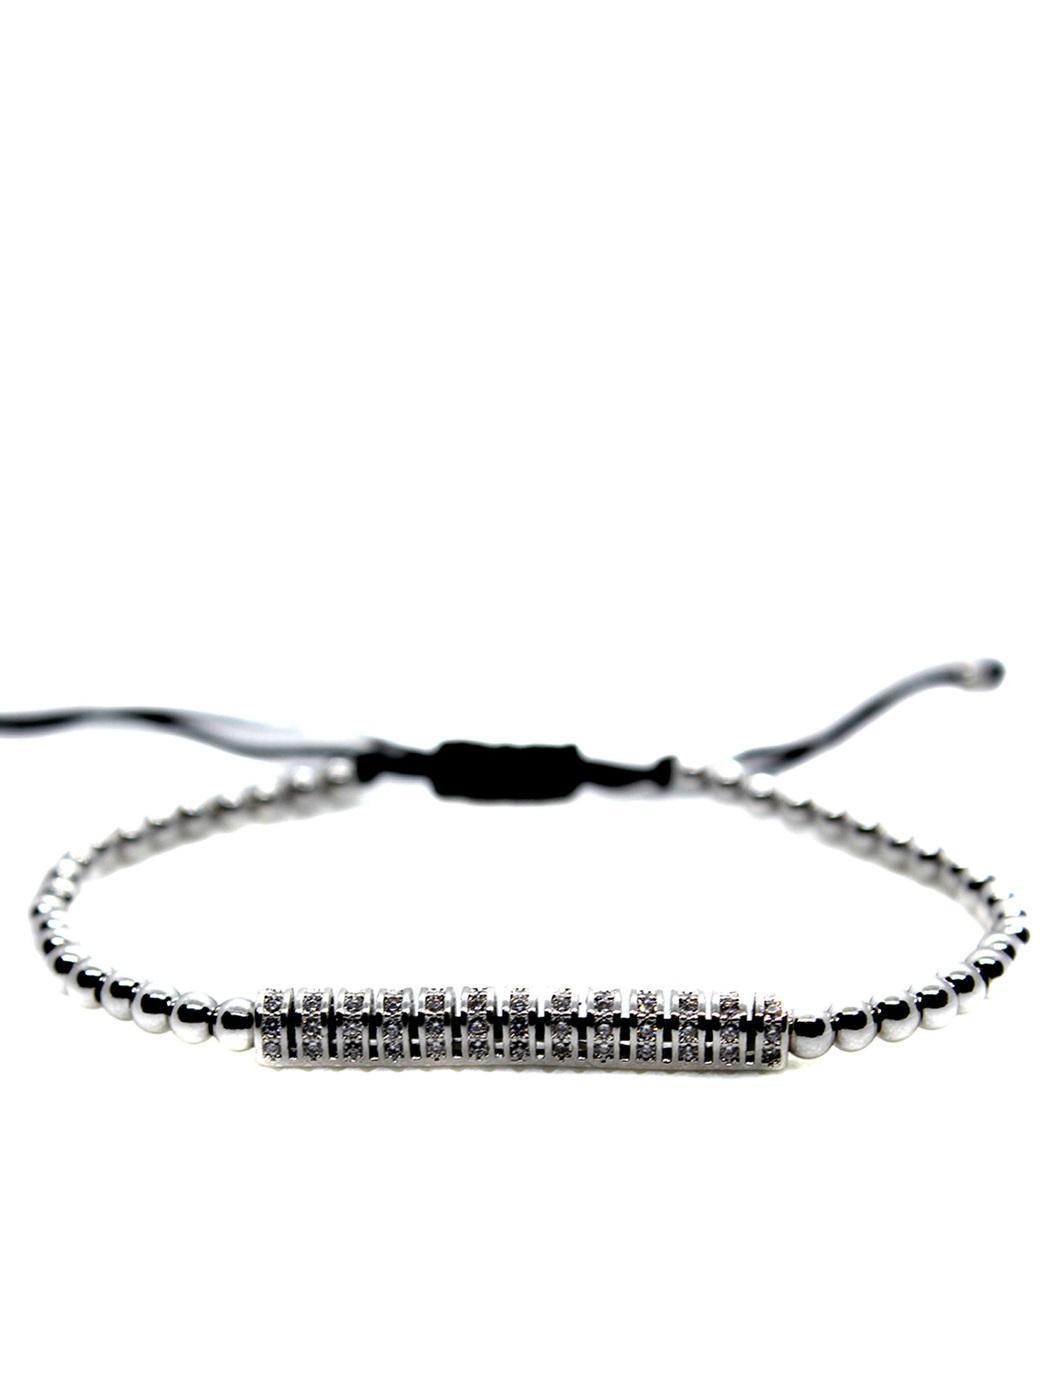 Sterling Silver Jewelry, Silver Bracelet For Women, Adjustable Silver Bracelet, Handcrafted Silver Bracelet, 925 Silver Bracelet, Designer Silver Bracelets, Silver Bracelet For Men, Silver Tennis Bracelet, Silver Charm Bracelet, Men's Diamond Bracelet In Stainless Steel